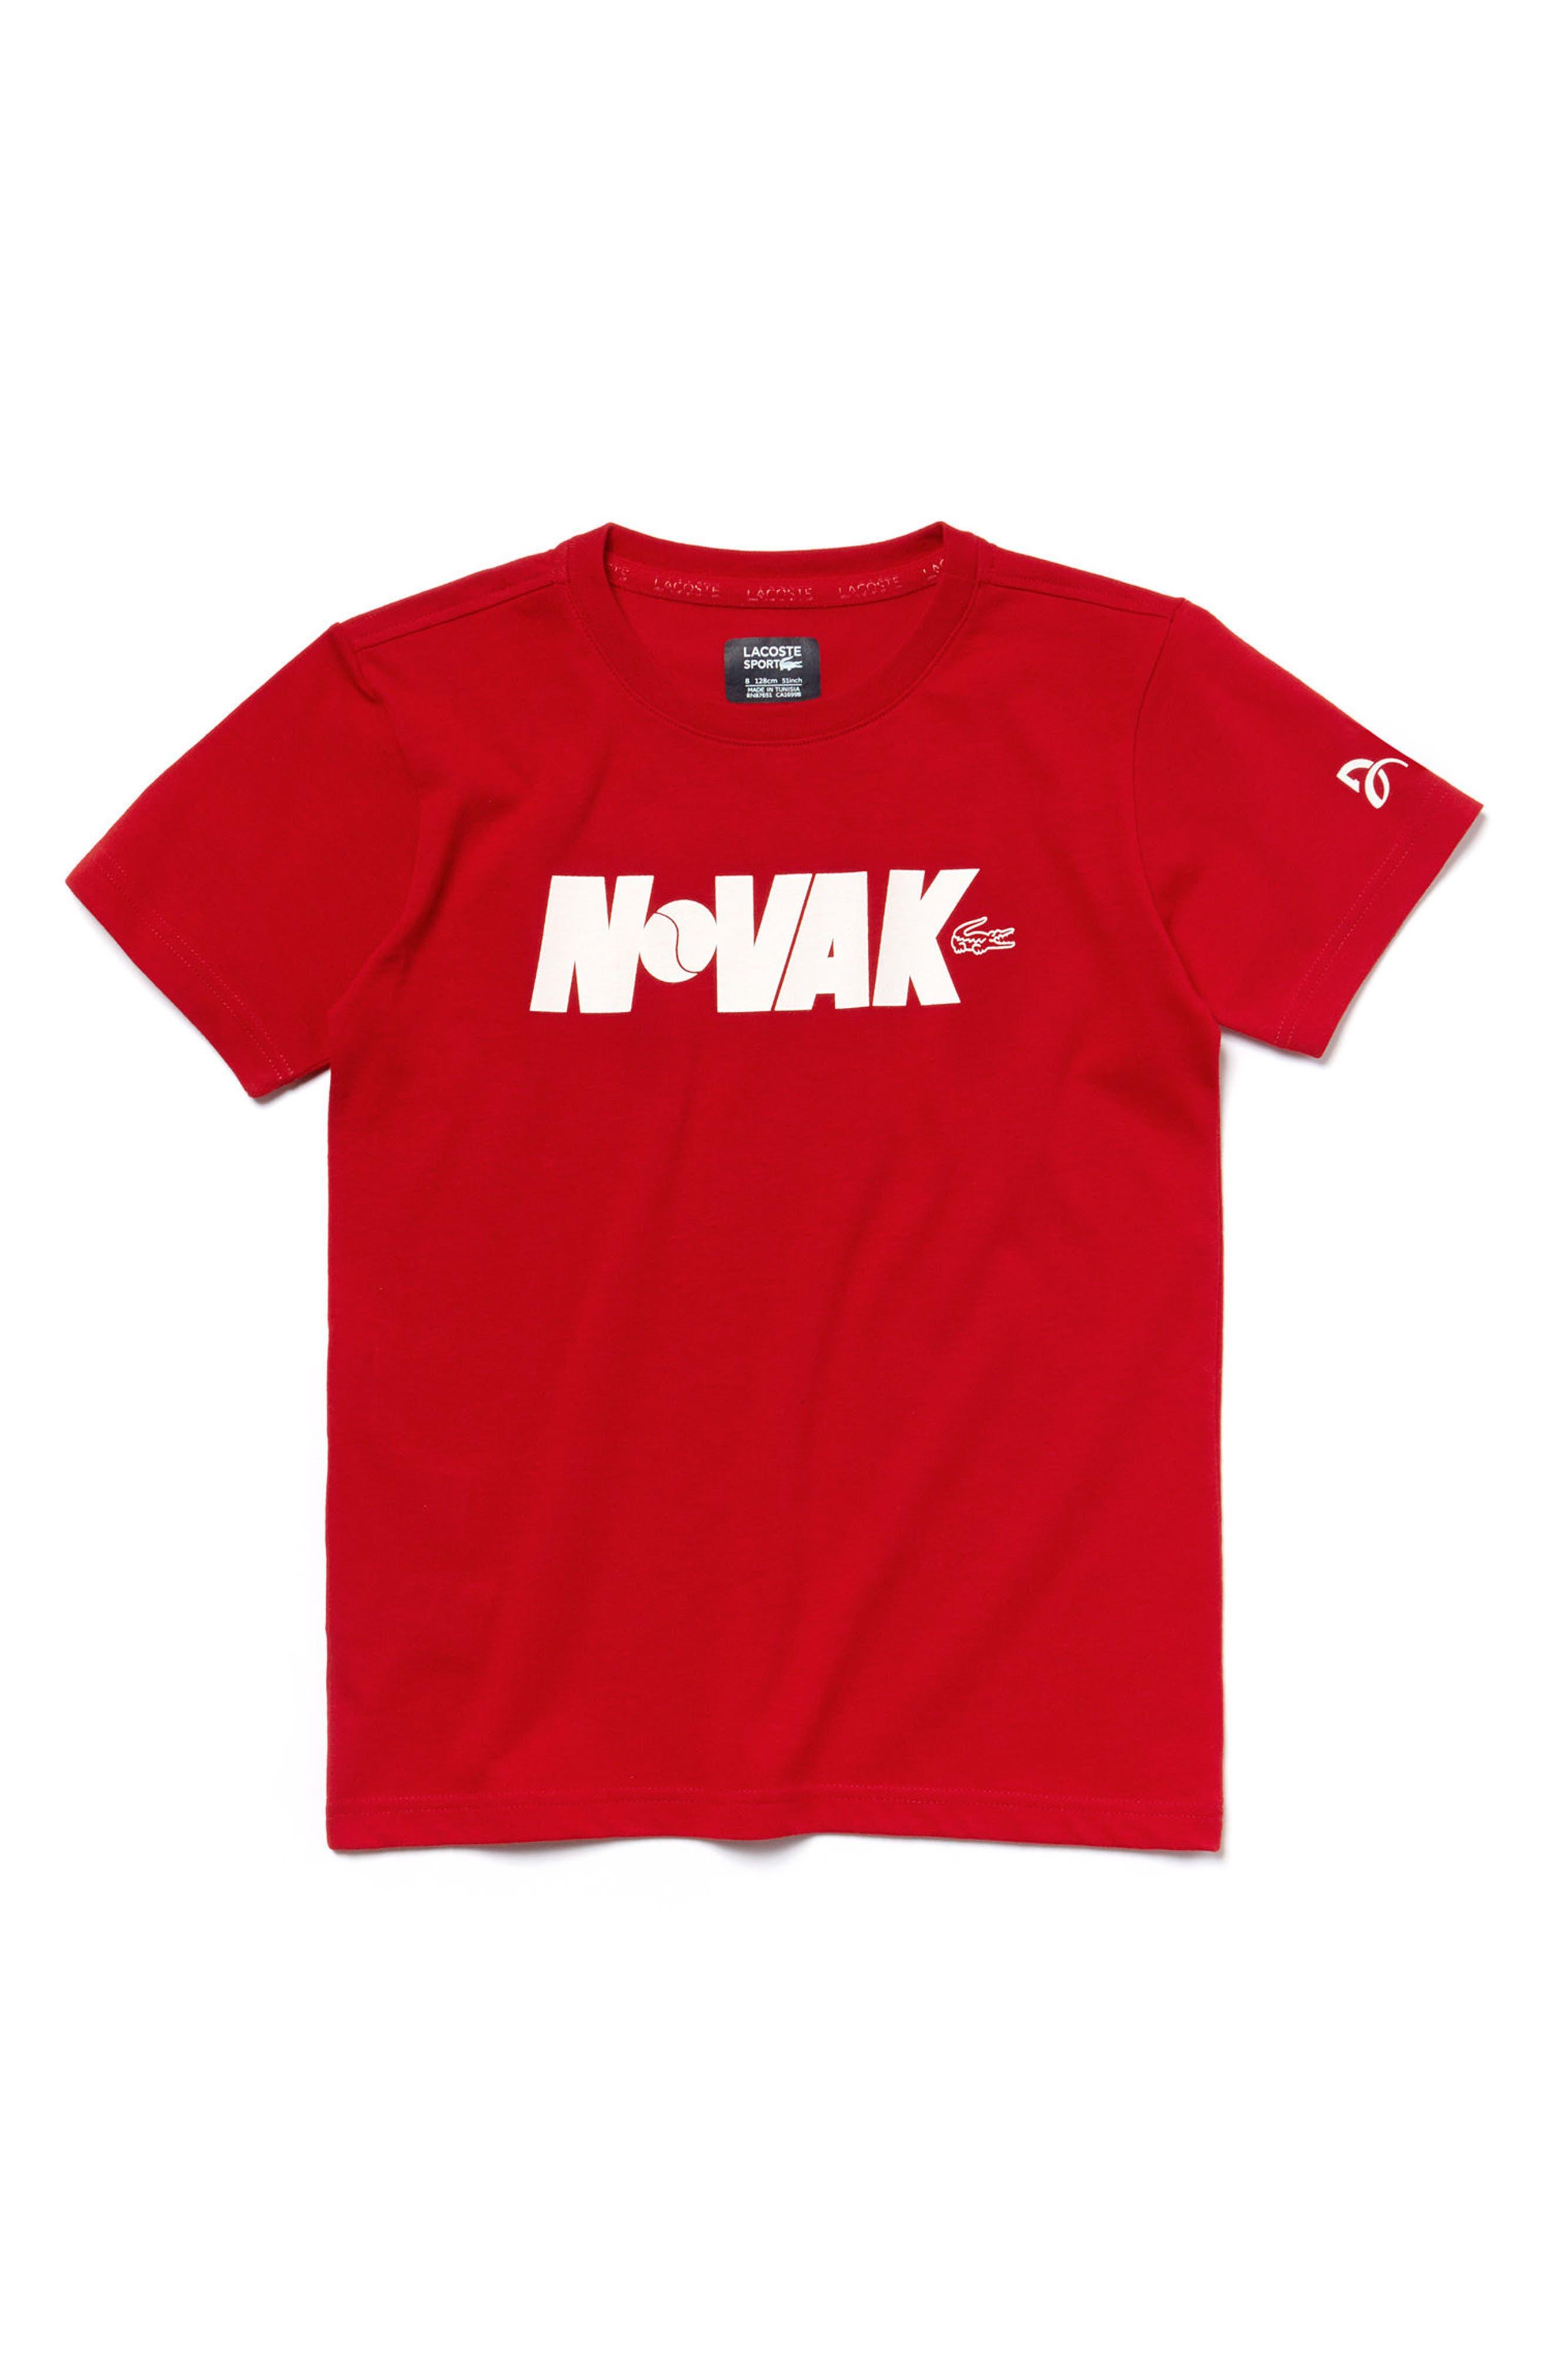 Novak Djokovic Tech Jersey T-Shirt,                             Main thumbnail 1, color,                             RED/ WHITE